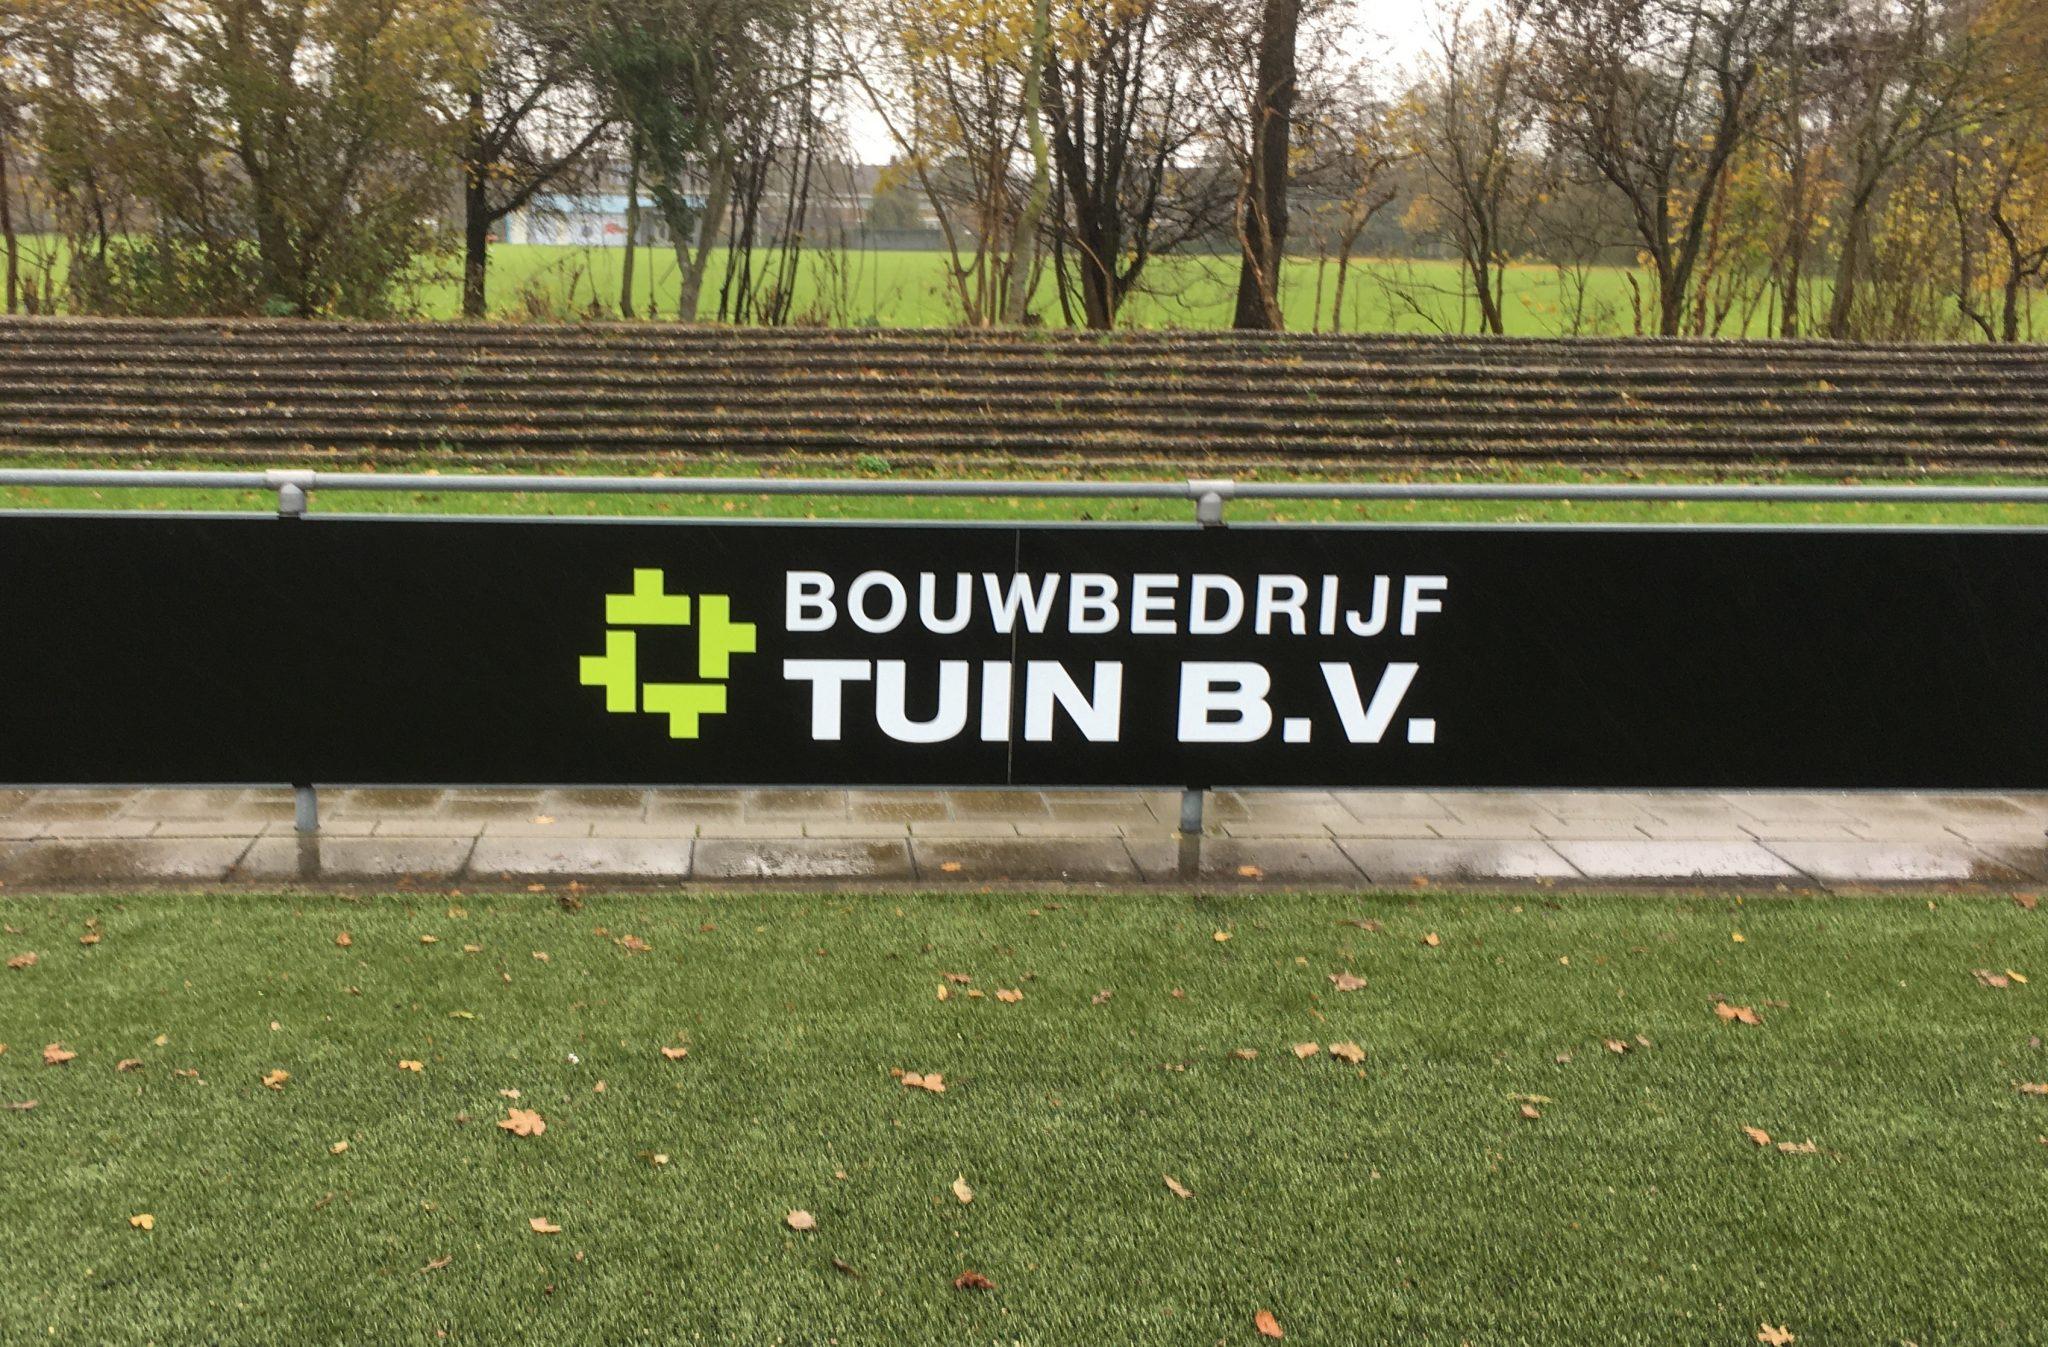 Bouwbedrijf tuin nieuwe bordsponsor